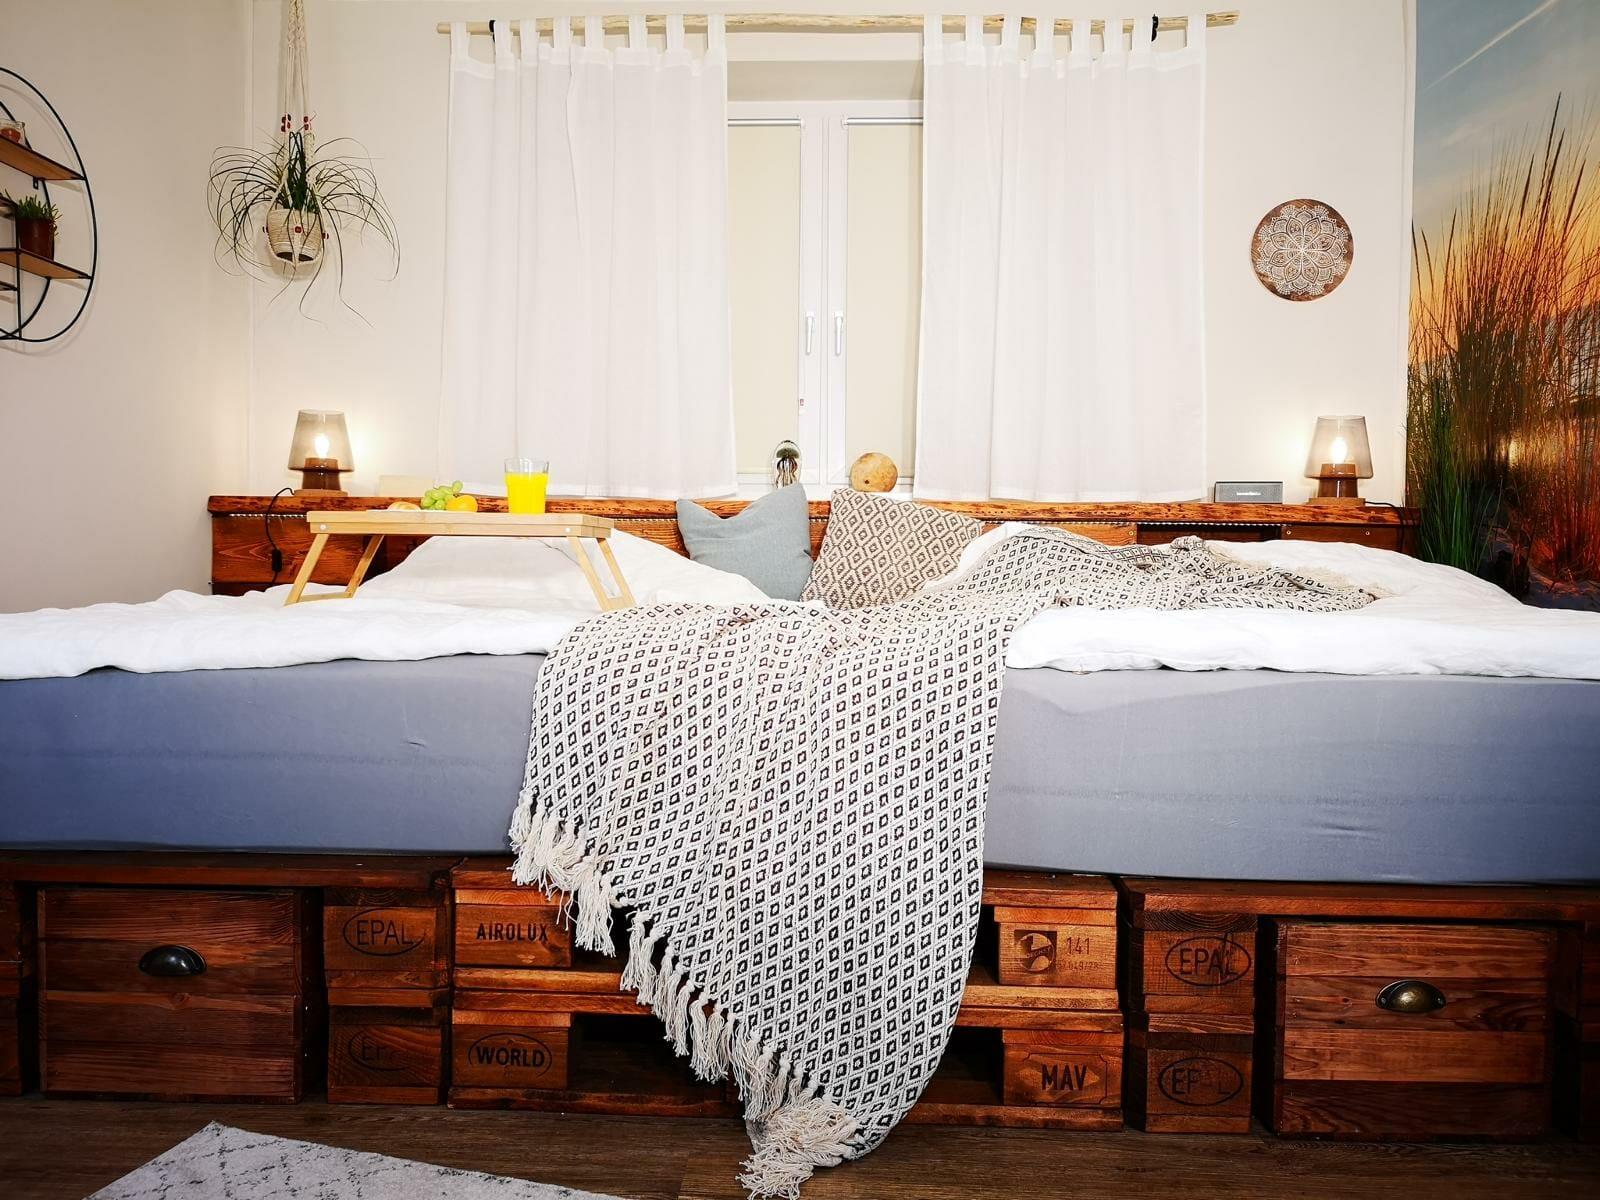 Full Size of Bett Günstig Kaufen Palettenbett Selber Bauen Europaletten Betten Kingsize Runde Bambus Stauraum Mit Treca Erhöhtes Ebay 180x200 200x180 Bock Schlafzimmer Bett Bett Günstig Kaufen